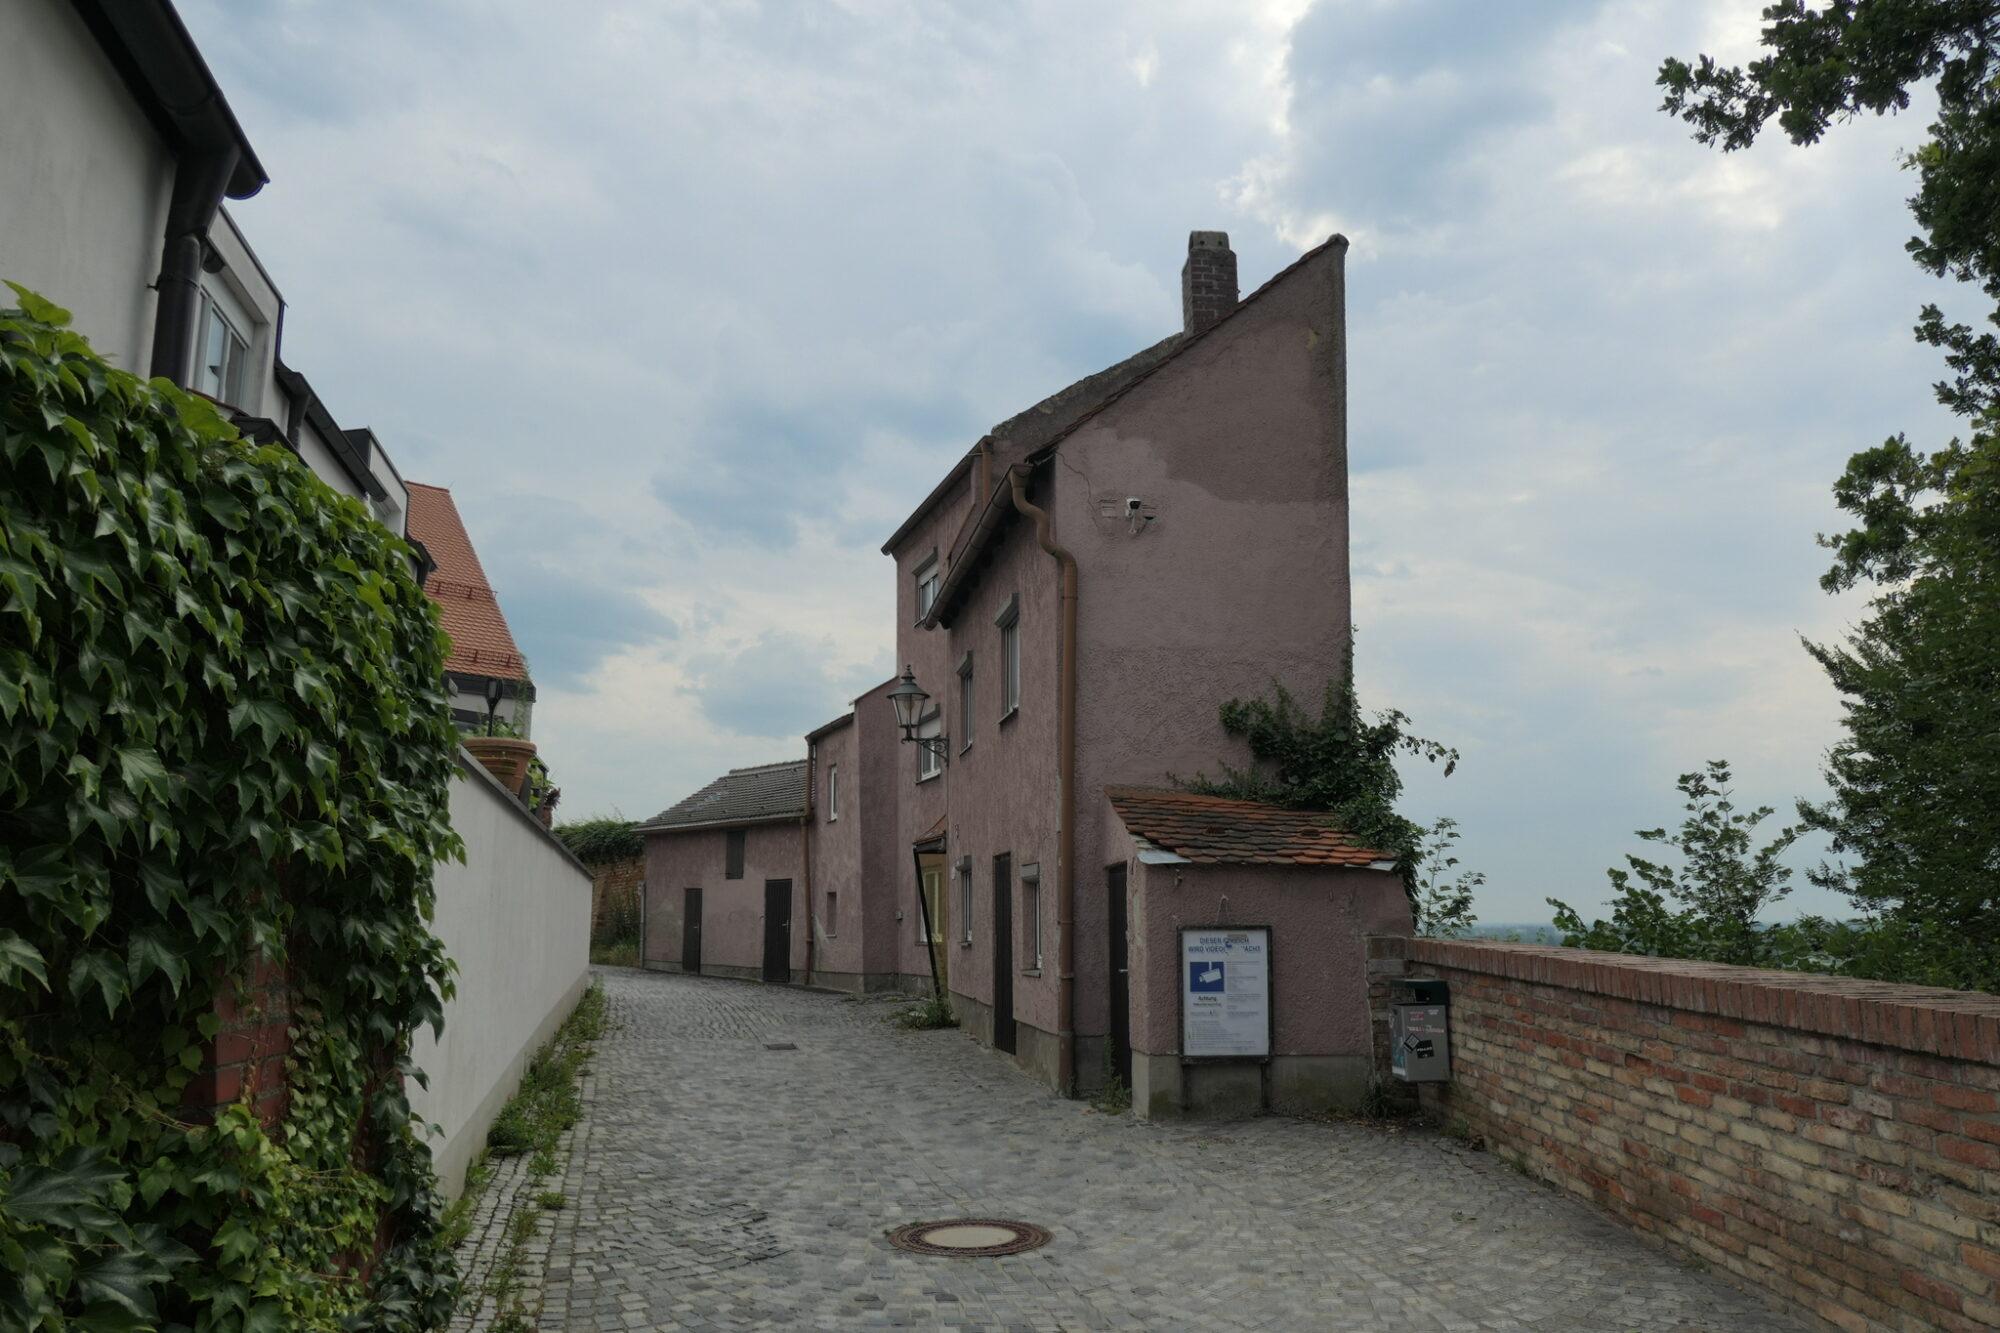 Hagerturm in Friedberg